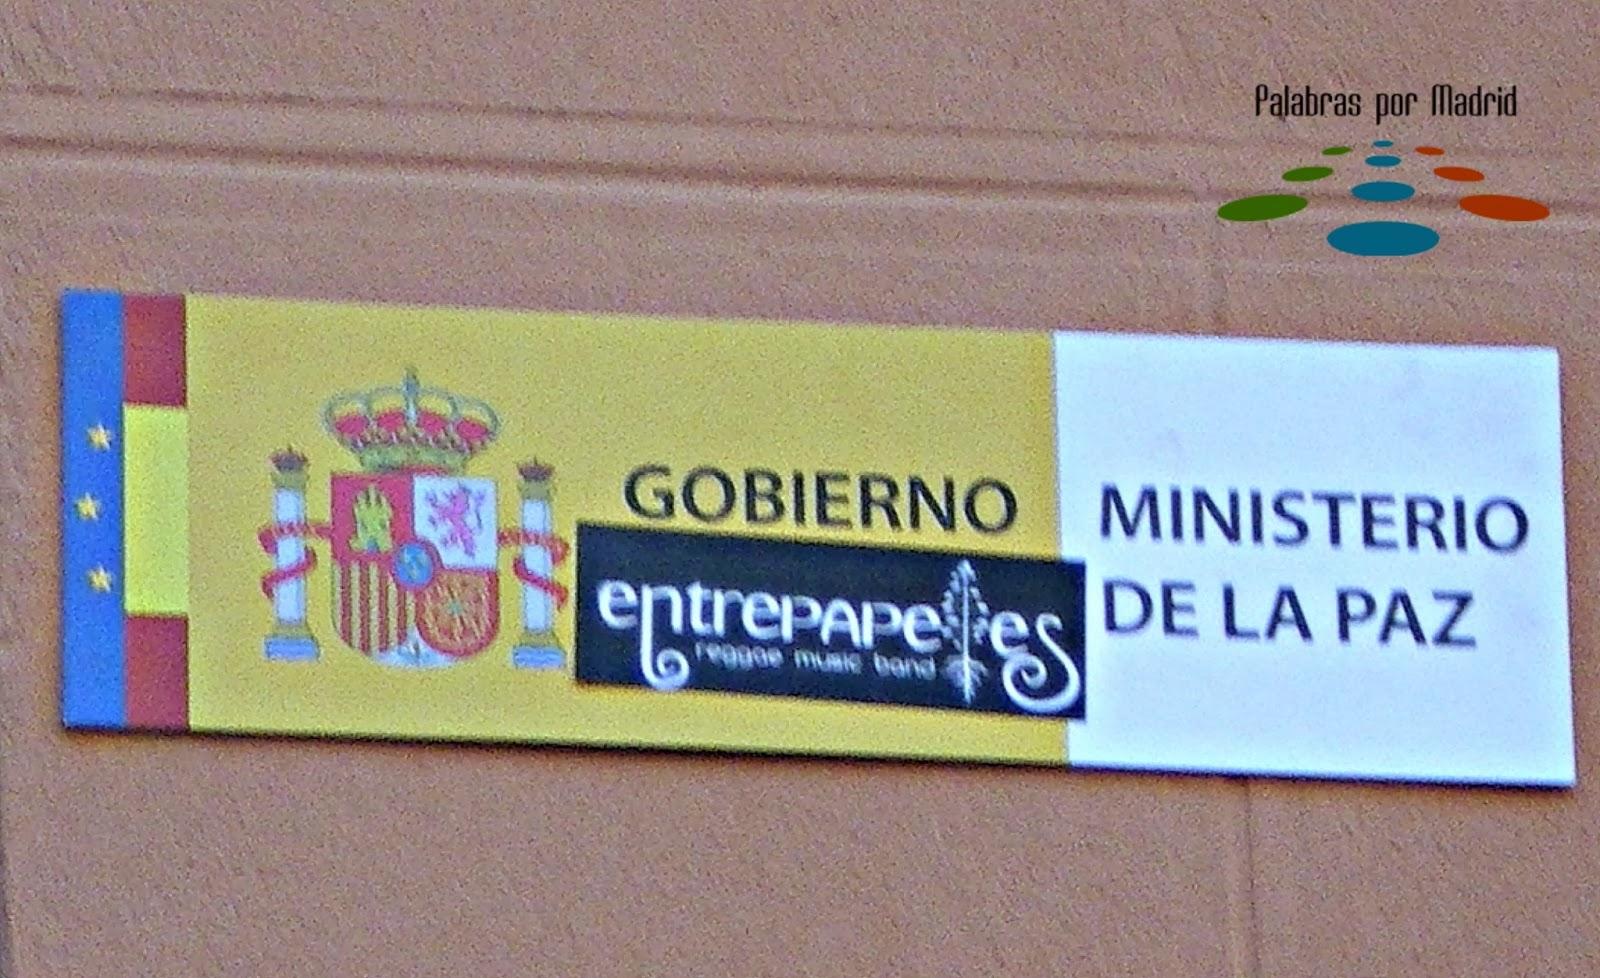 Paz interior aprende espa ol callejeando por madrid for Ministerio de interior madrid